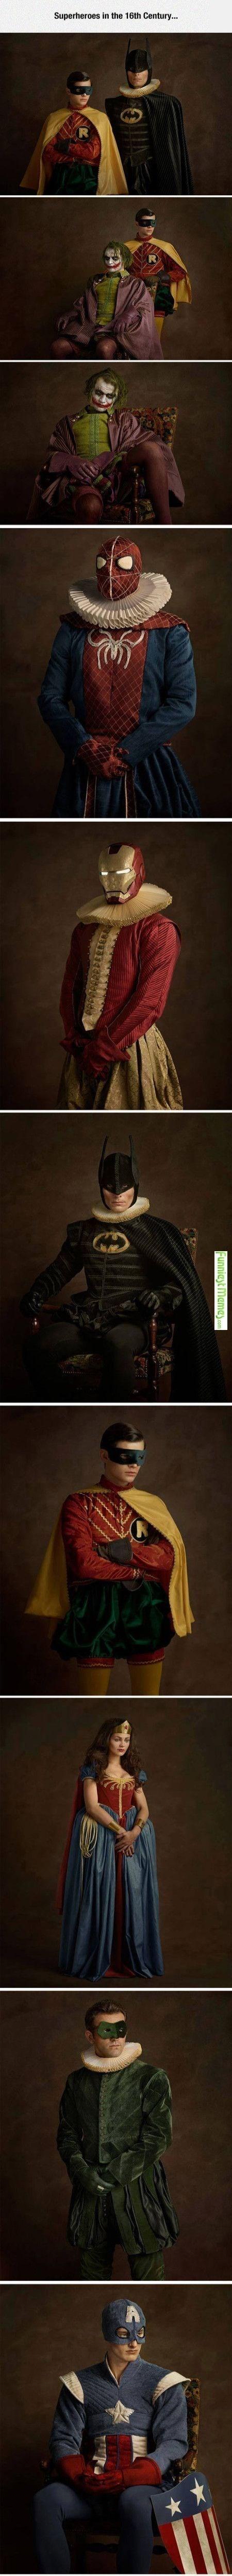 joker batman - 8999119360